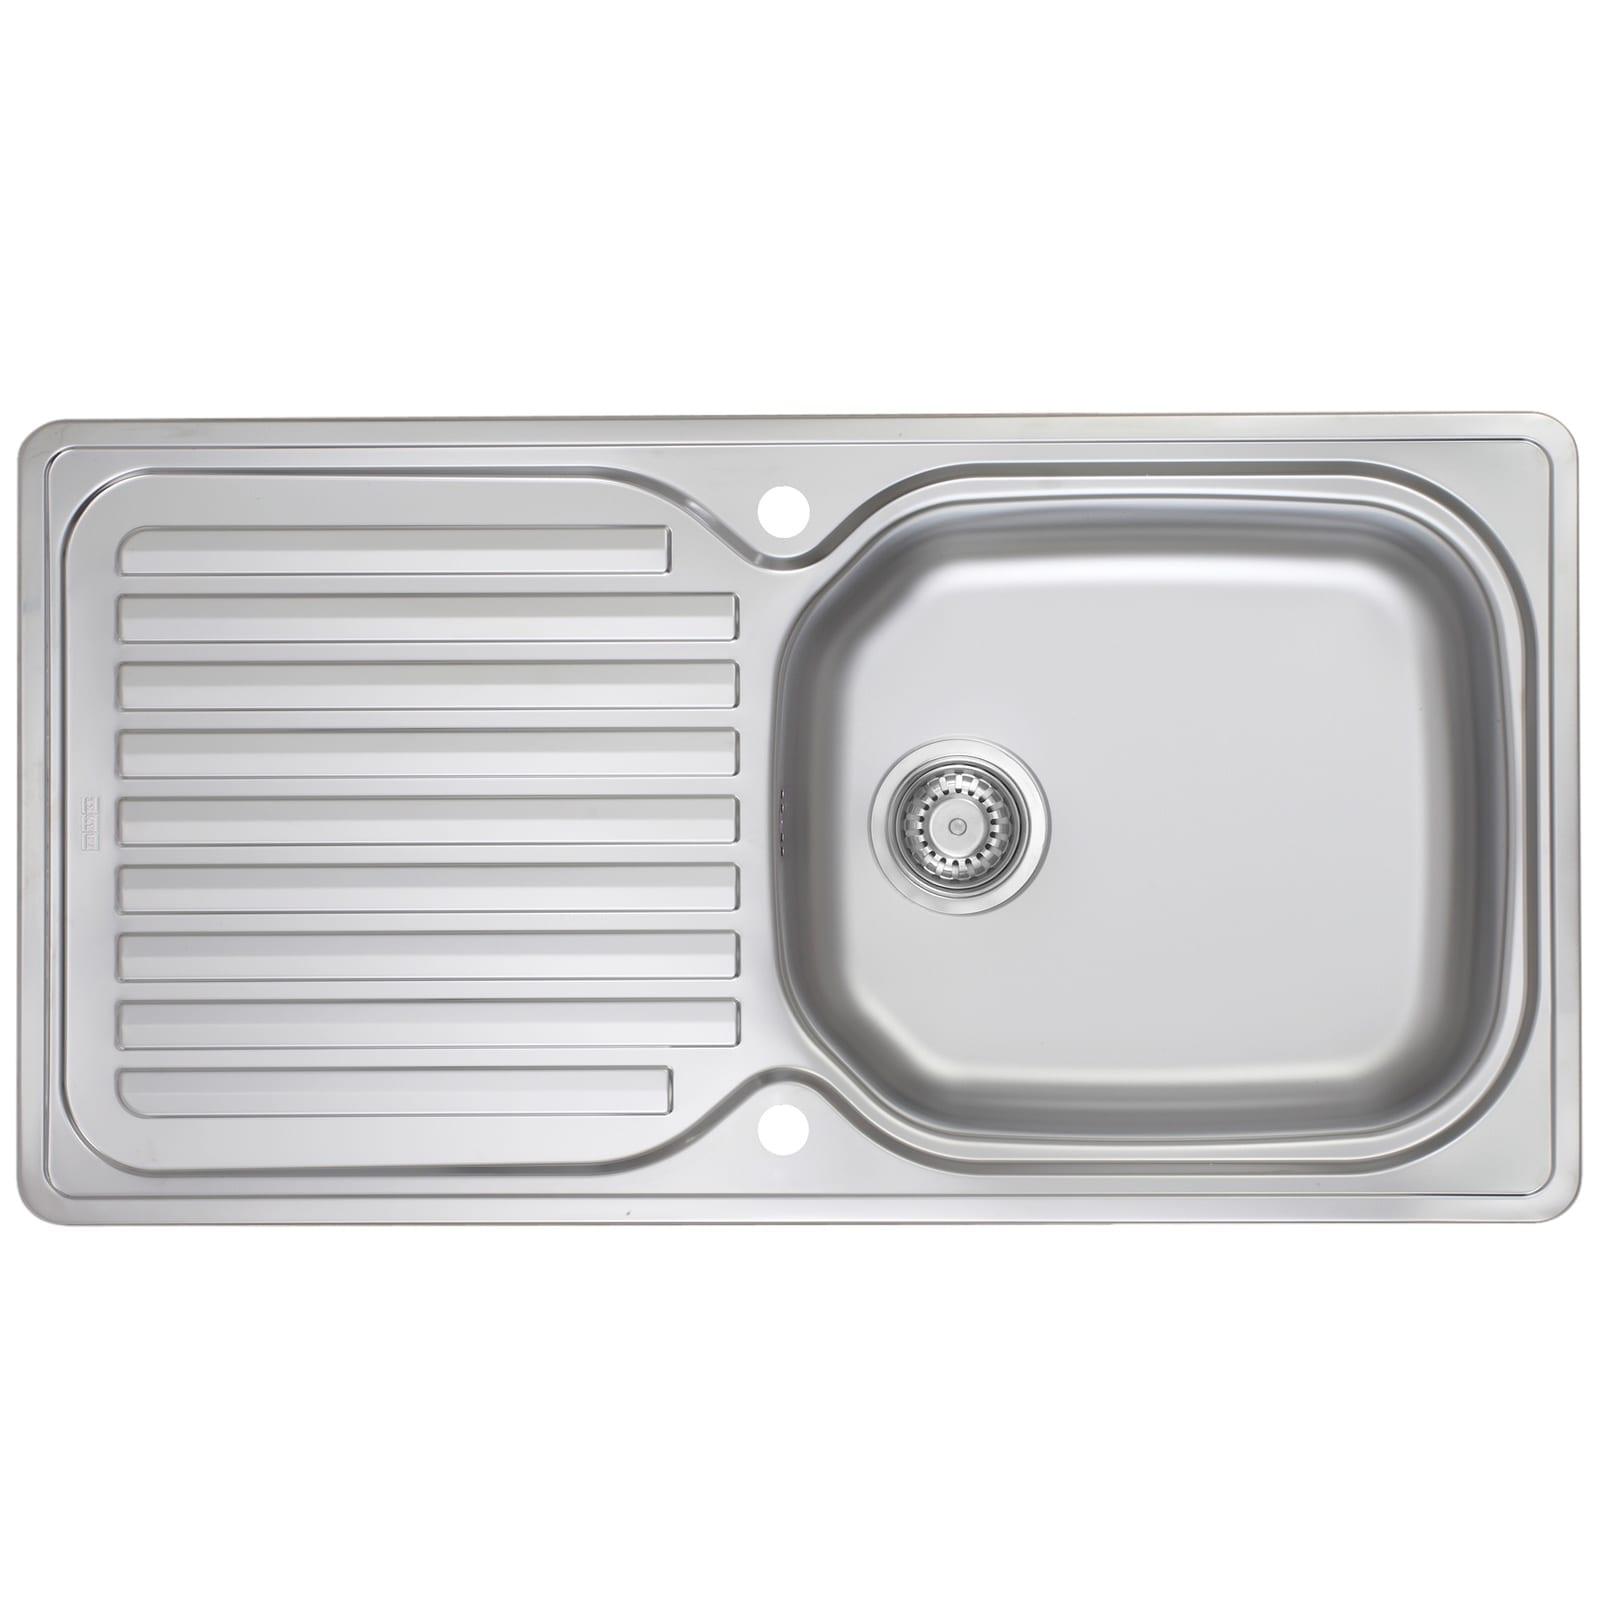 Franke elba eln611 96 1 0 bowl reversible stainless steel kitchen sink waste at ship it appliances